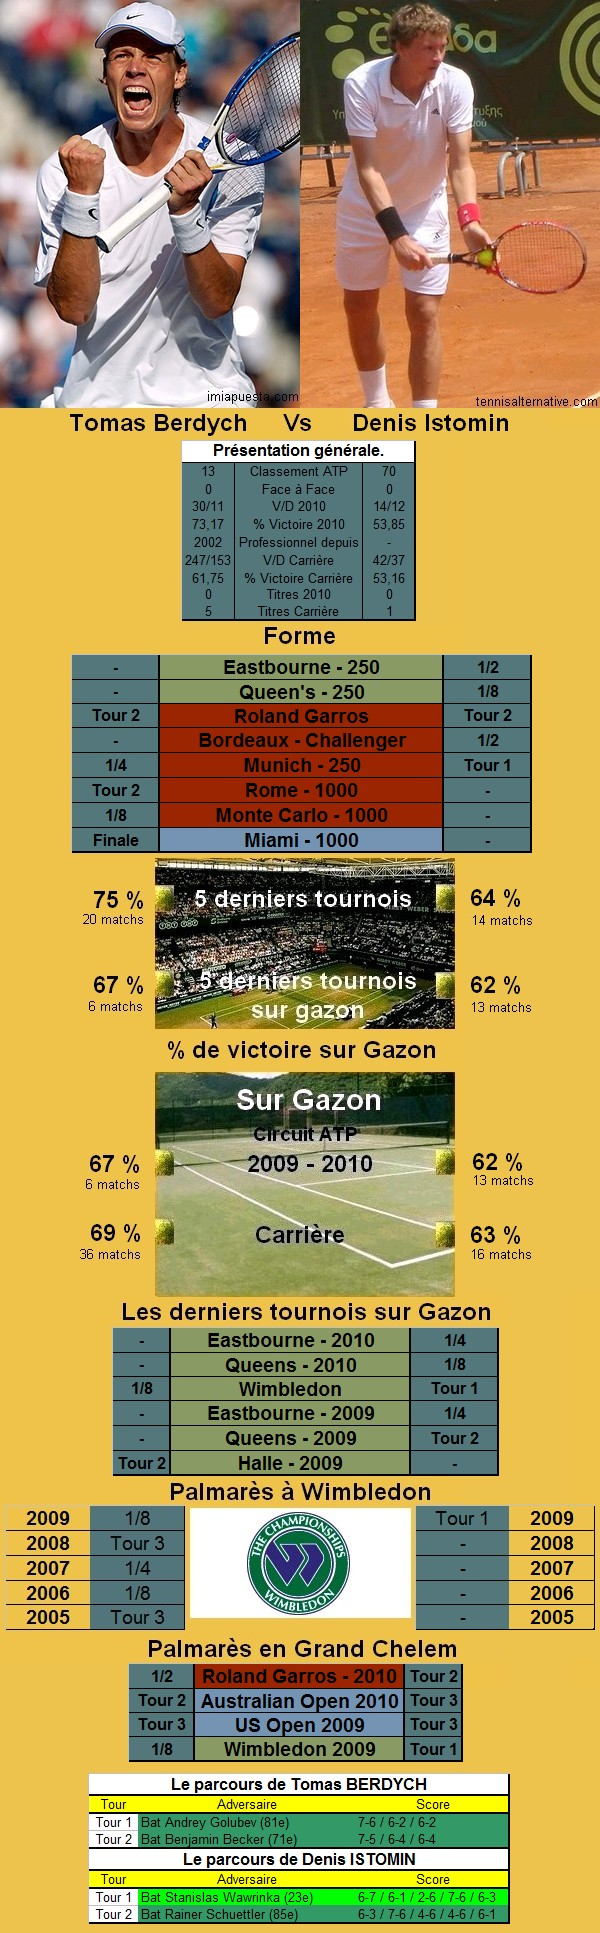 Statistiques tennis de Berdych contre Istomin à Wimbledon